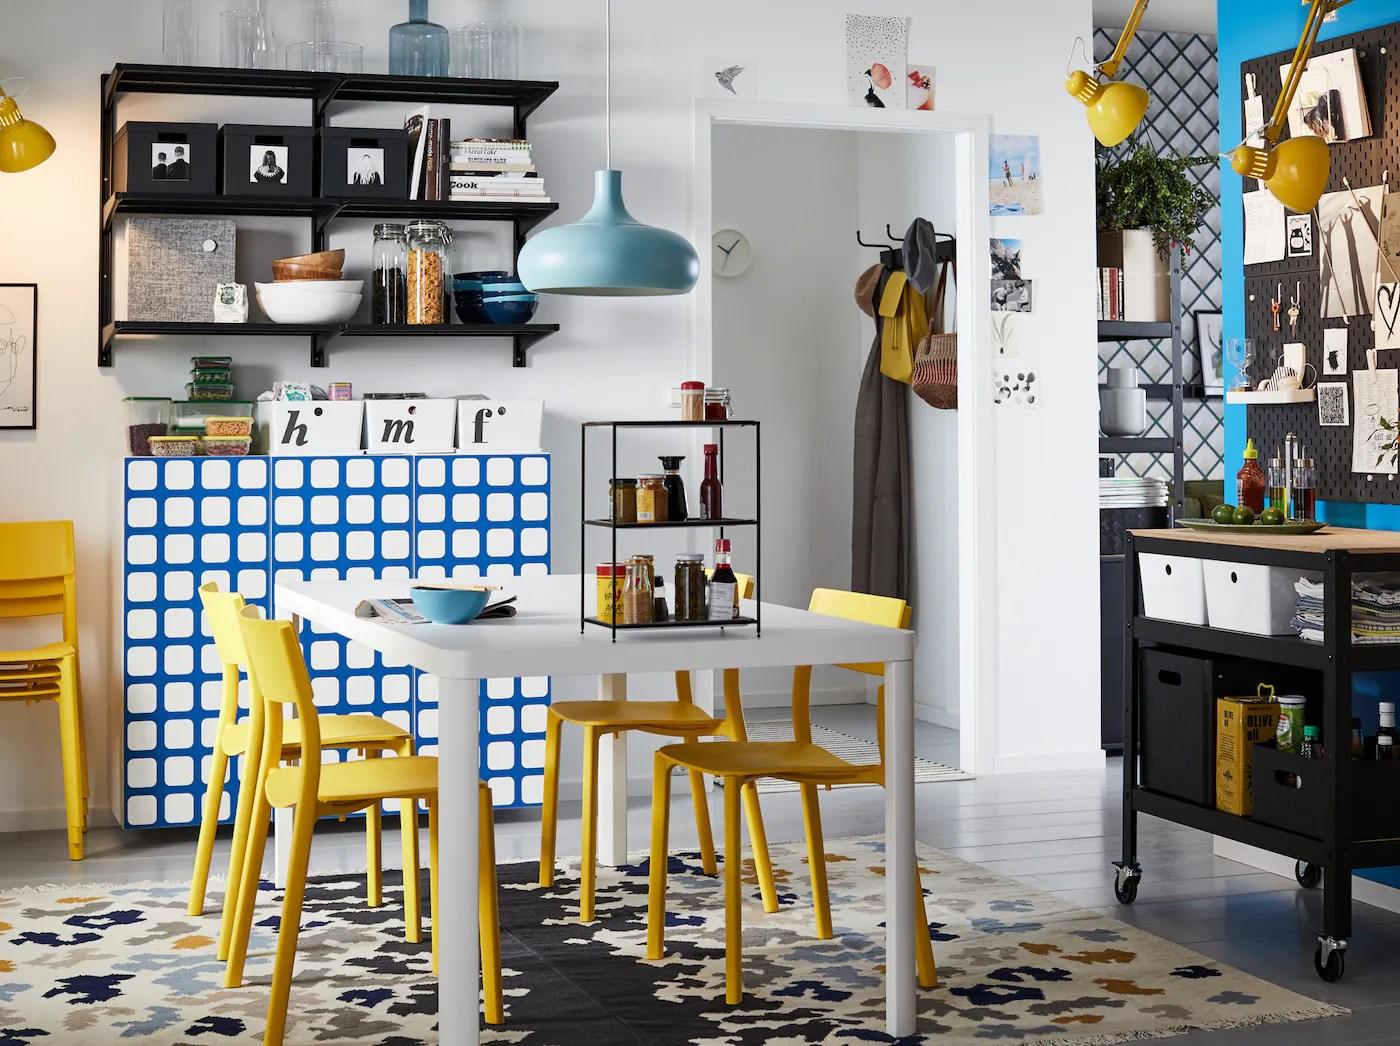 Galerie Salle à Manger Ikea